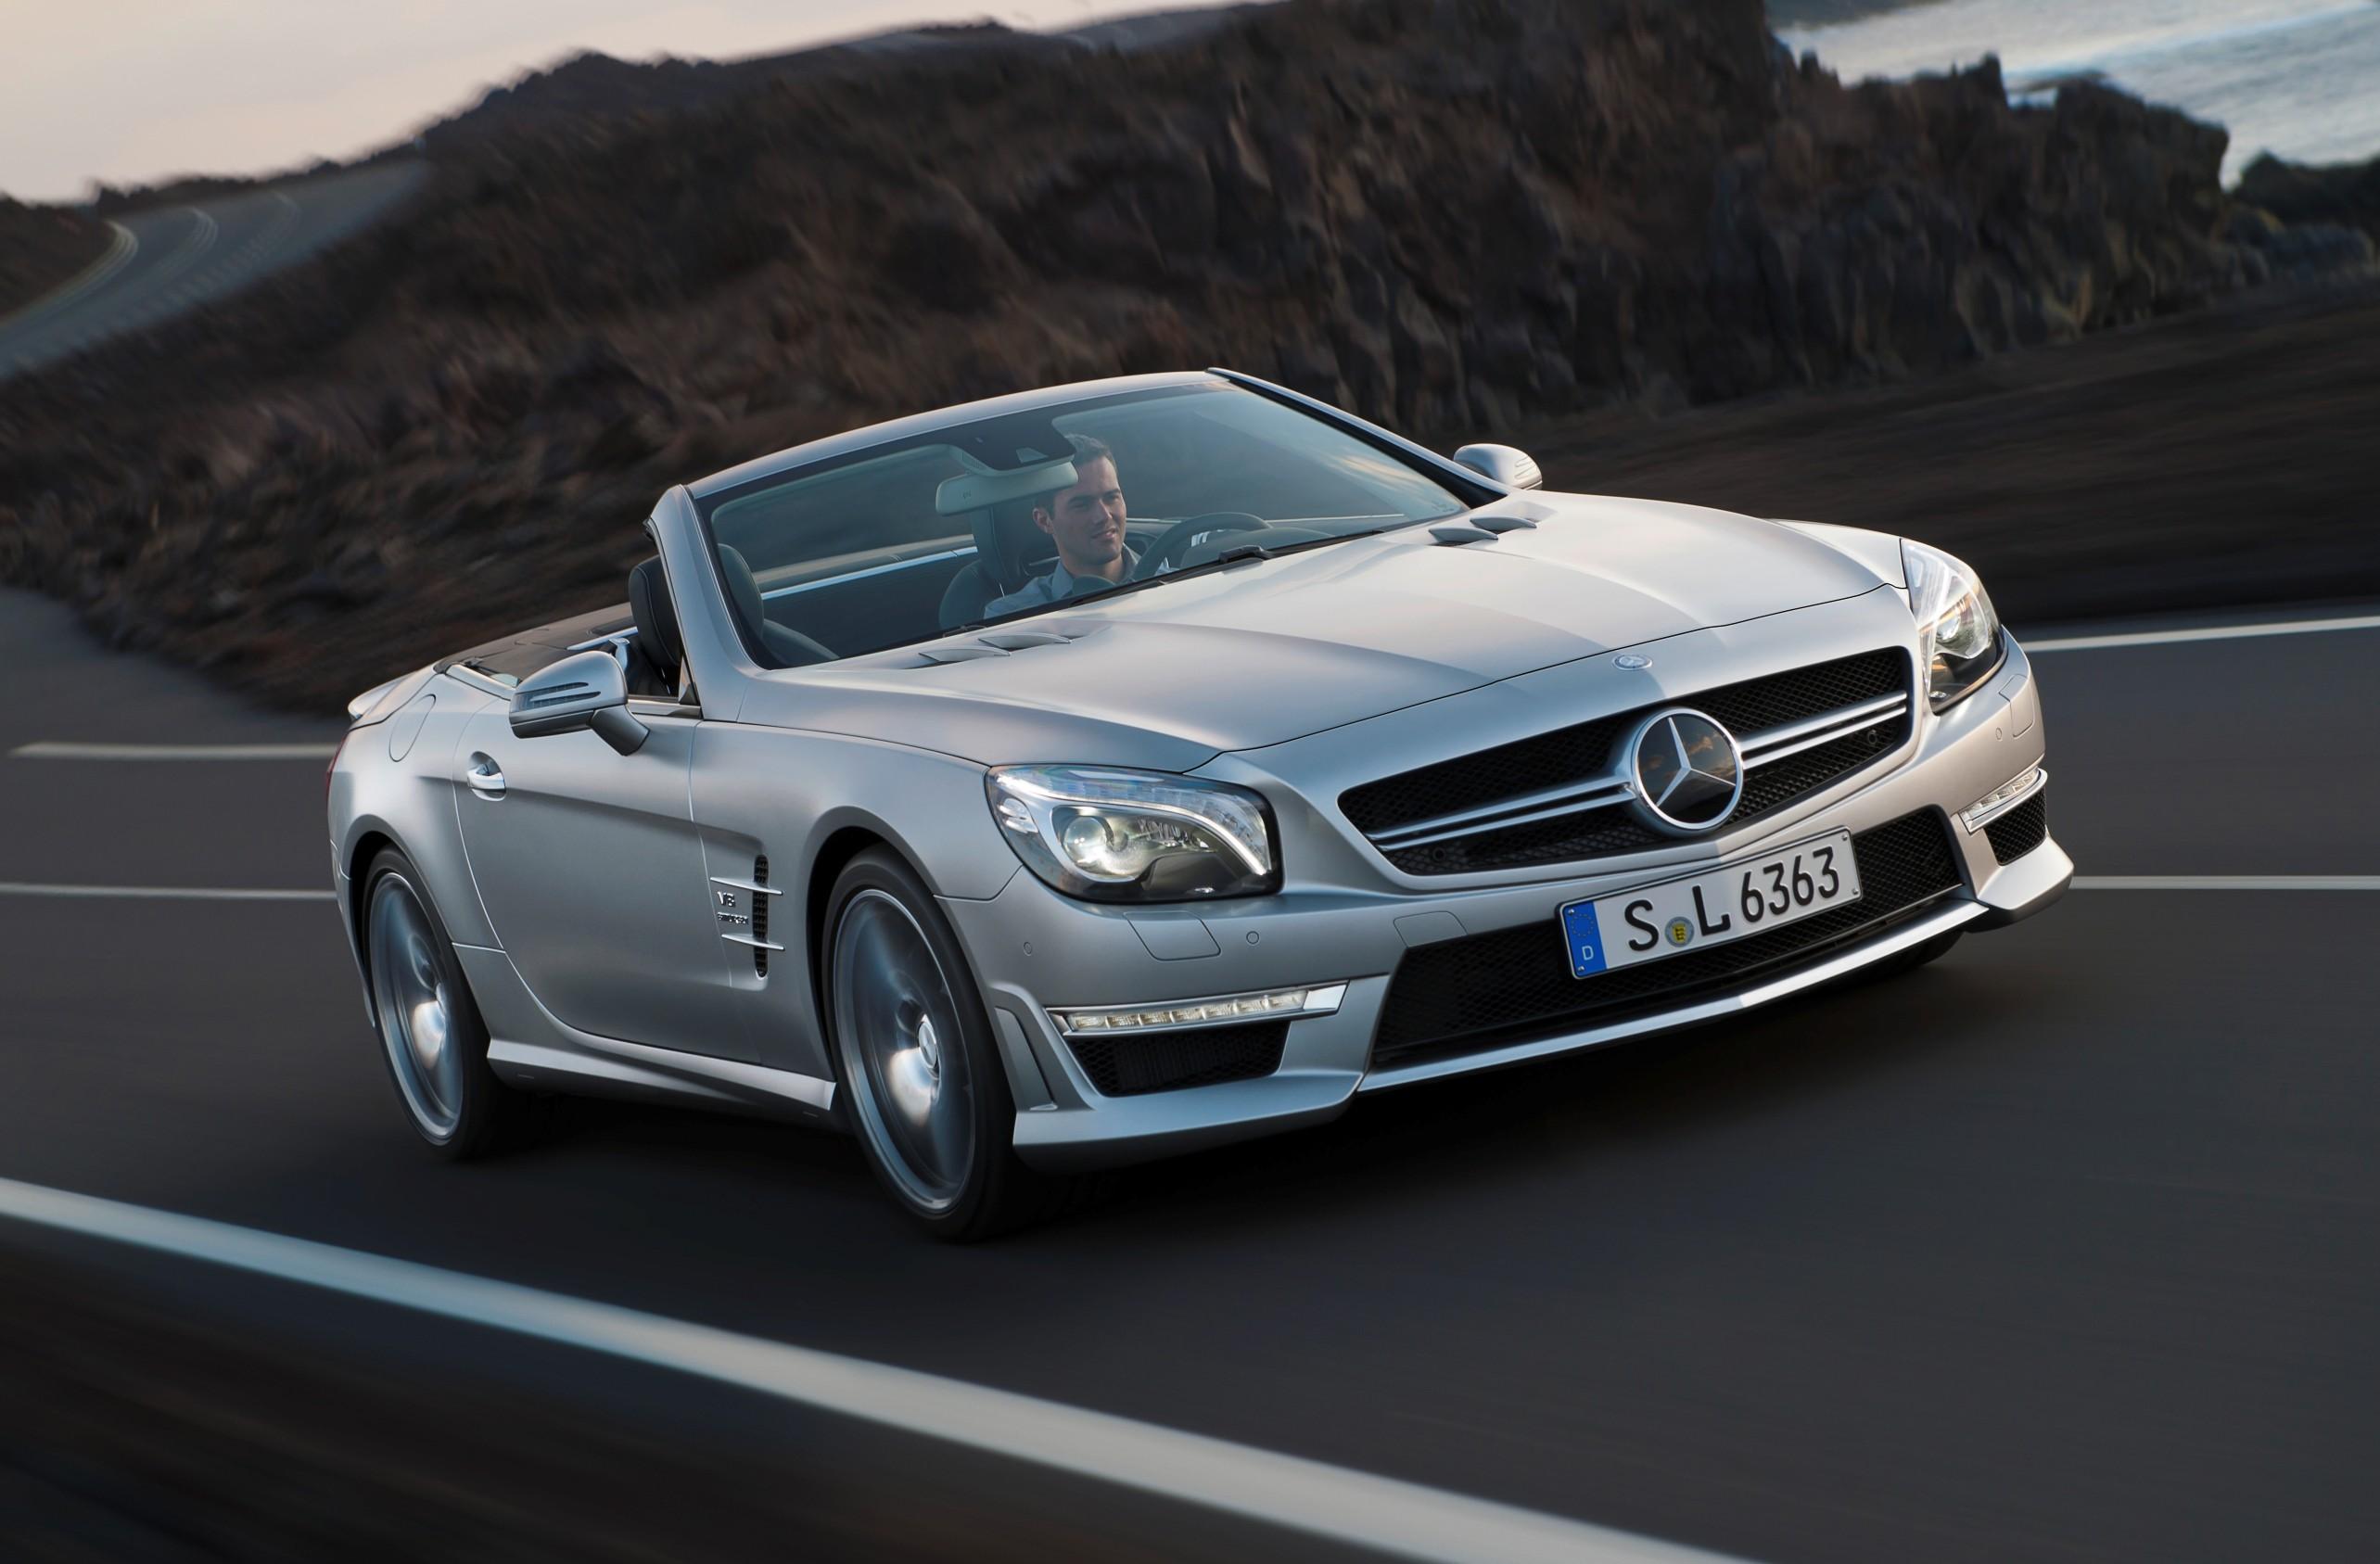 2013 Mercedes-Benz SL63 AMG Unleashed